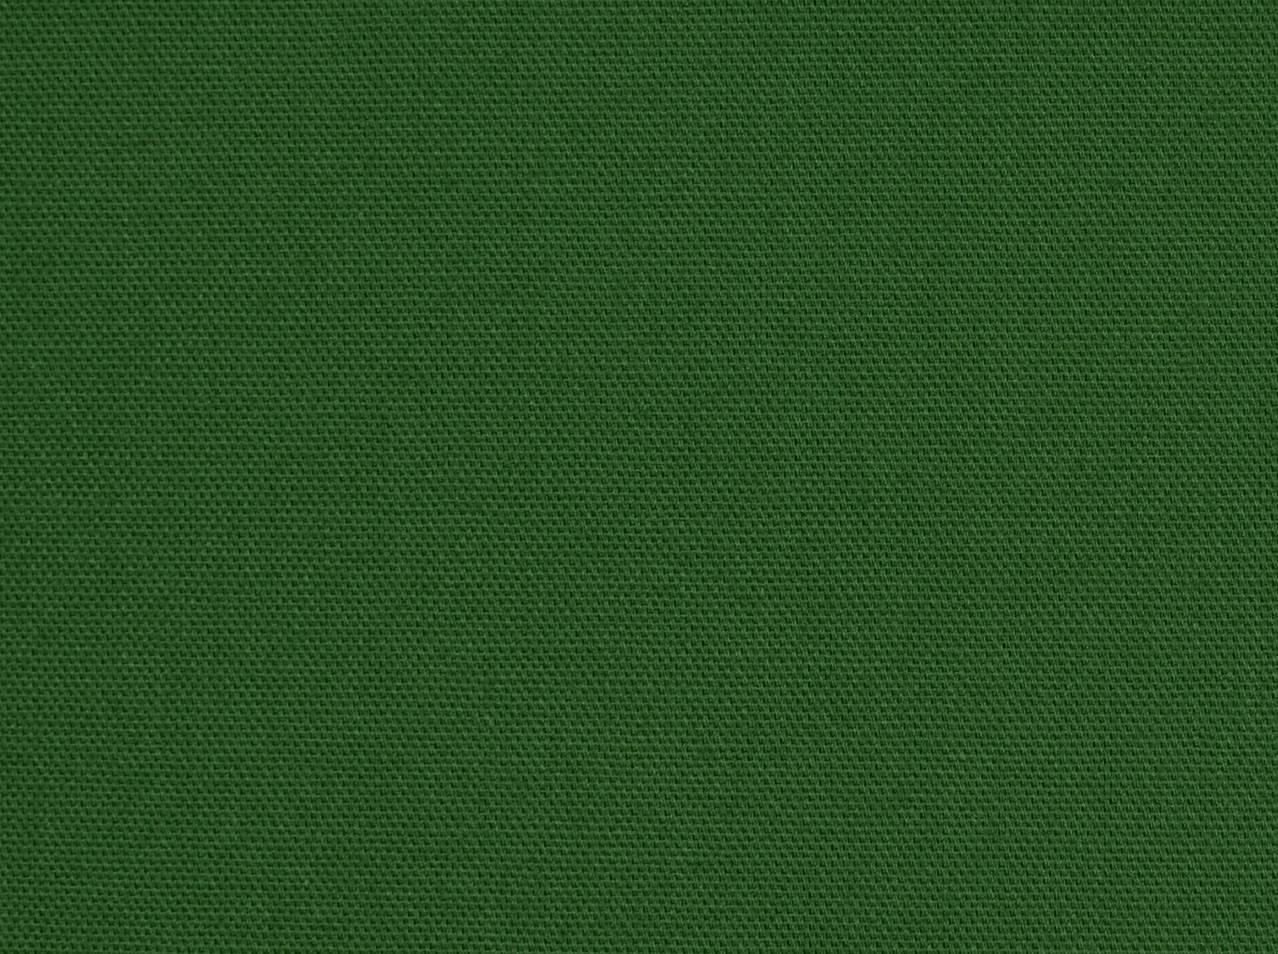 Covington Solids%20and%20Textures Lavate